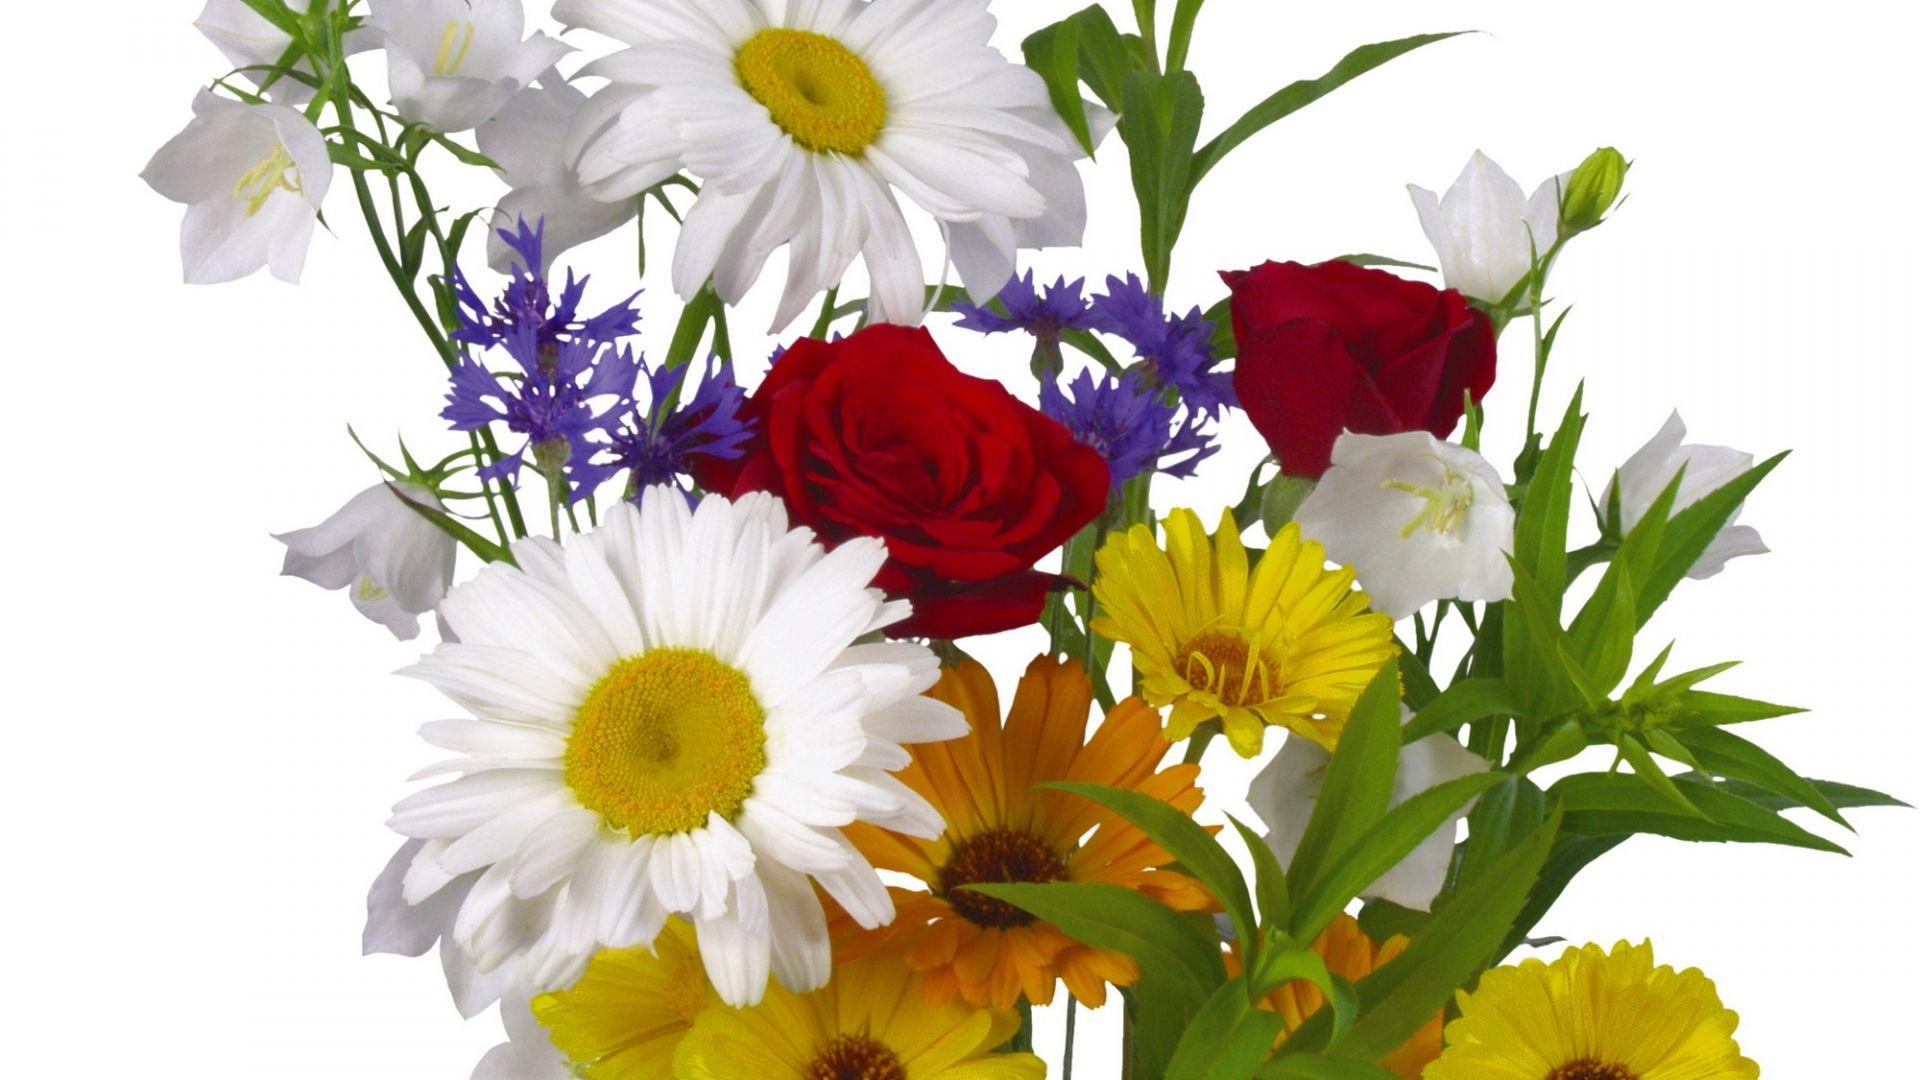 roses, daisies, gerberas - http://www.wallpapers4u.org/roses-daisies-gerberas/